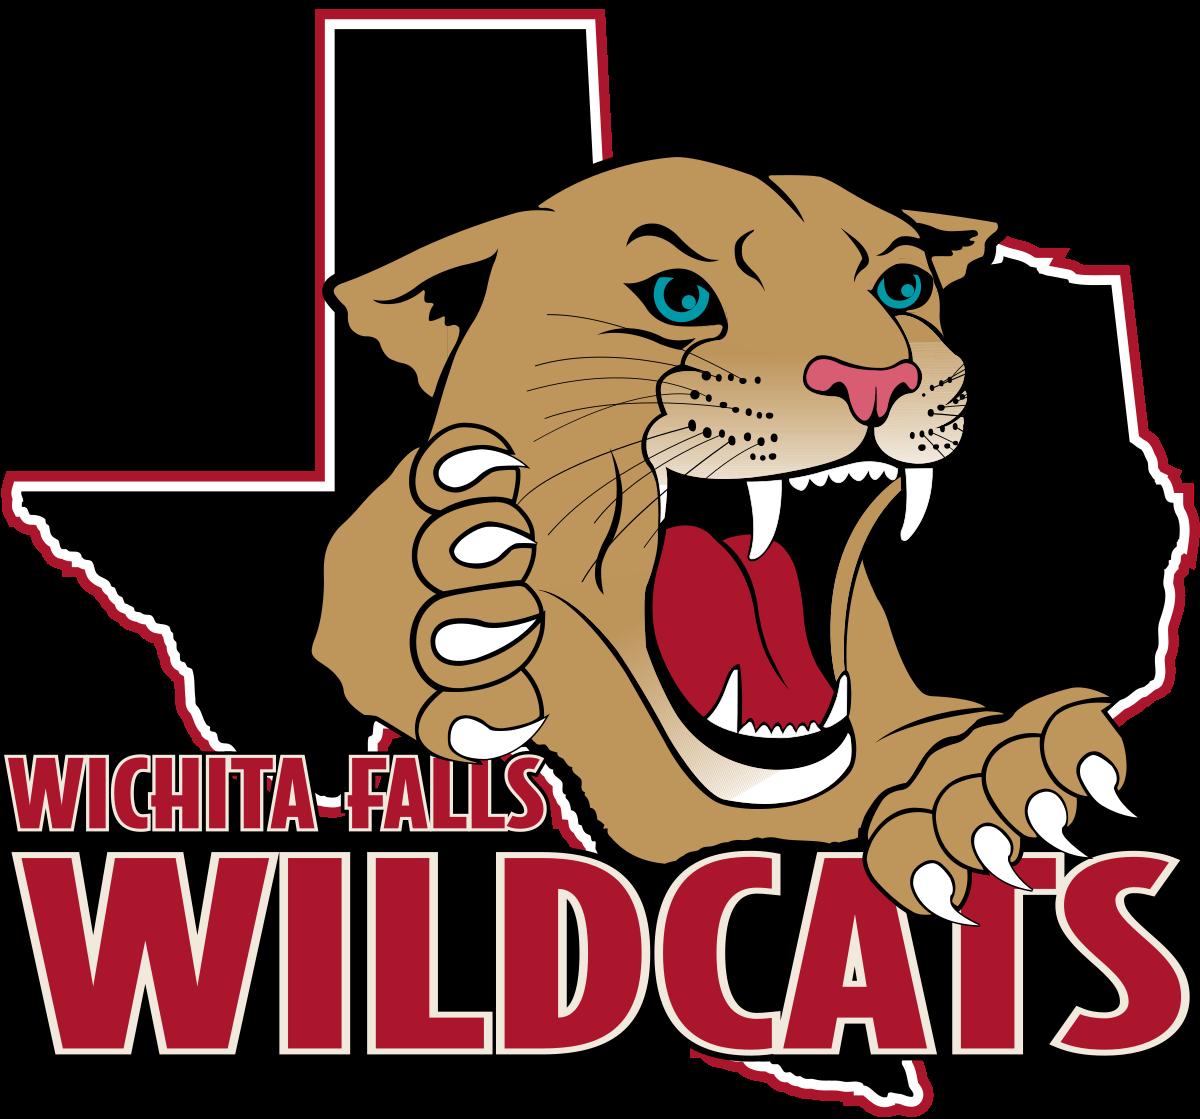 Wichita falls wildcats wikipedia. Wildcat clipart bobcat football